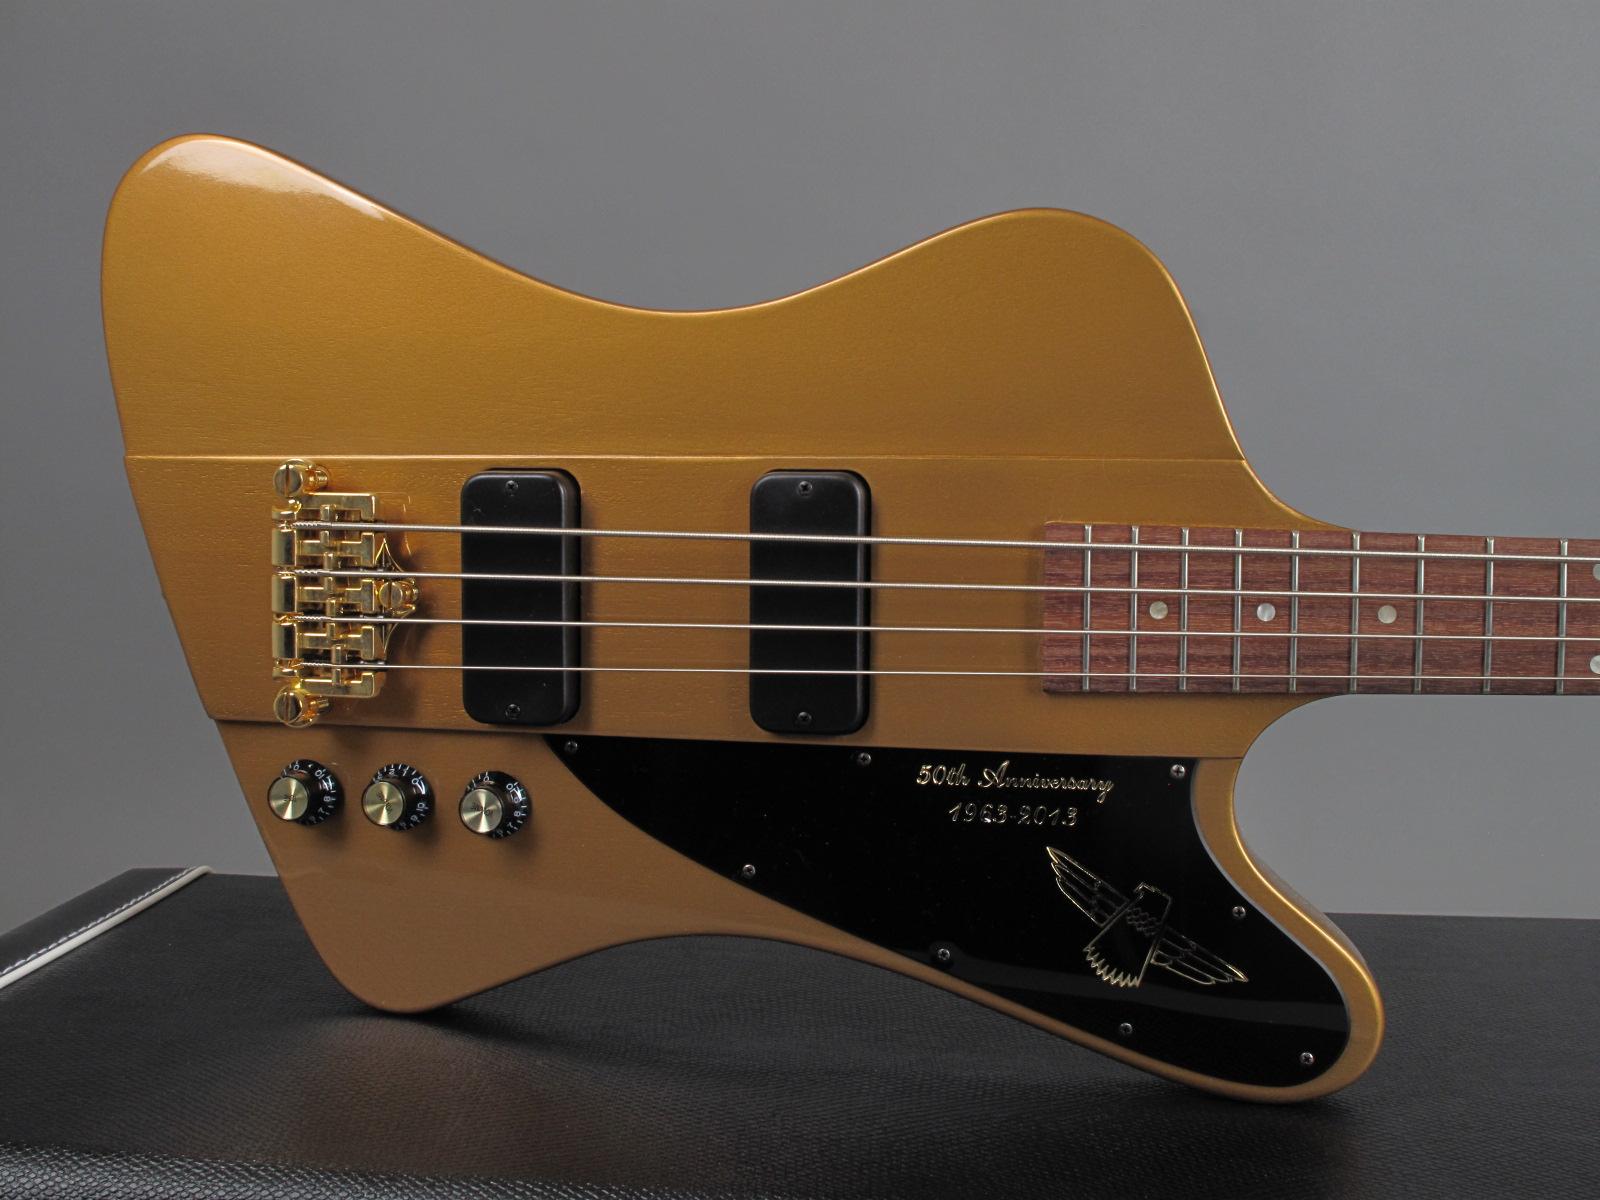 https://guitarpoint.de/app/uploads/products/2013-gibson-thunderbird-50th-anniversary-bullion-gold/2013-Gibson-Thunderbird-50thAnn-Gold-9.jpg